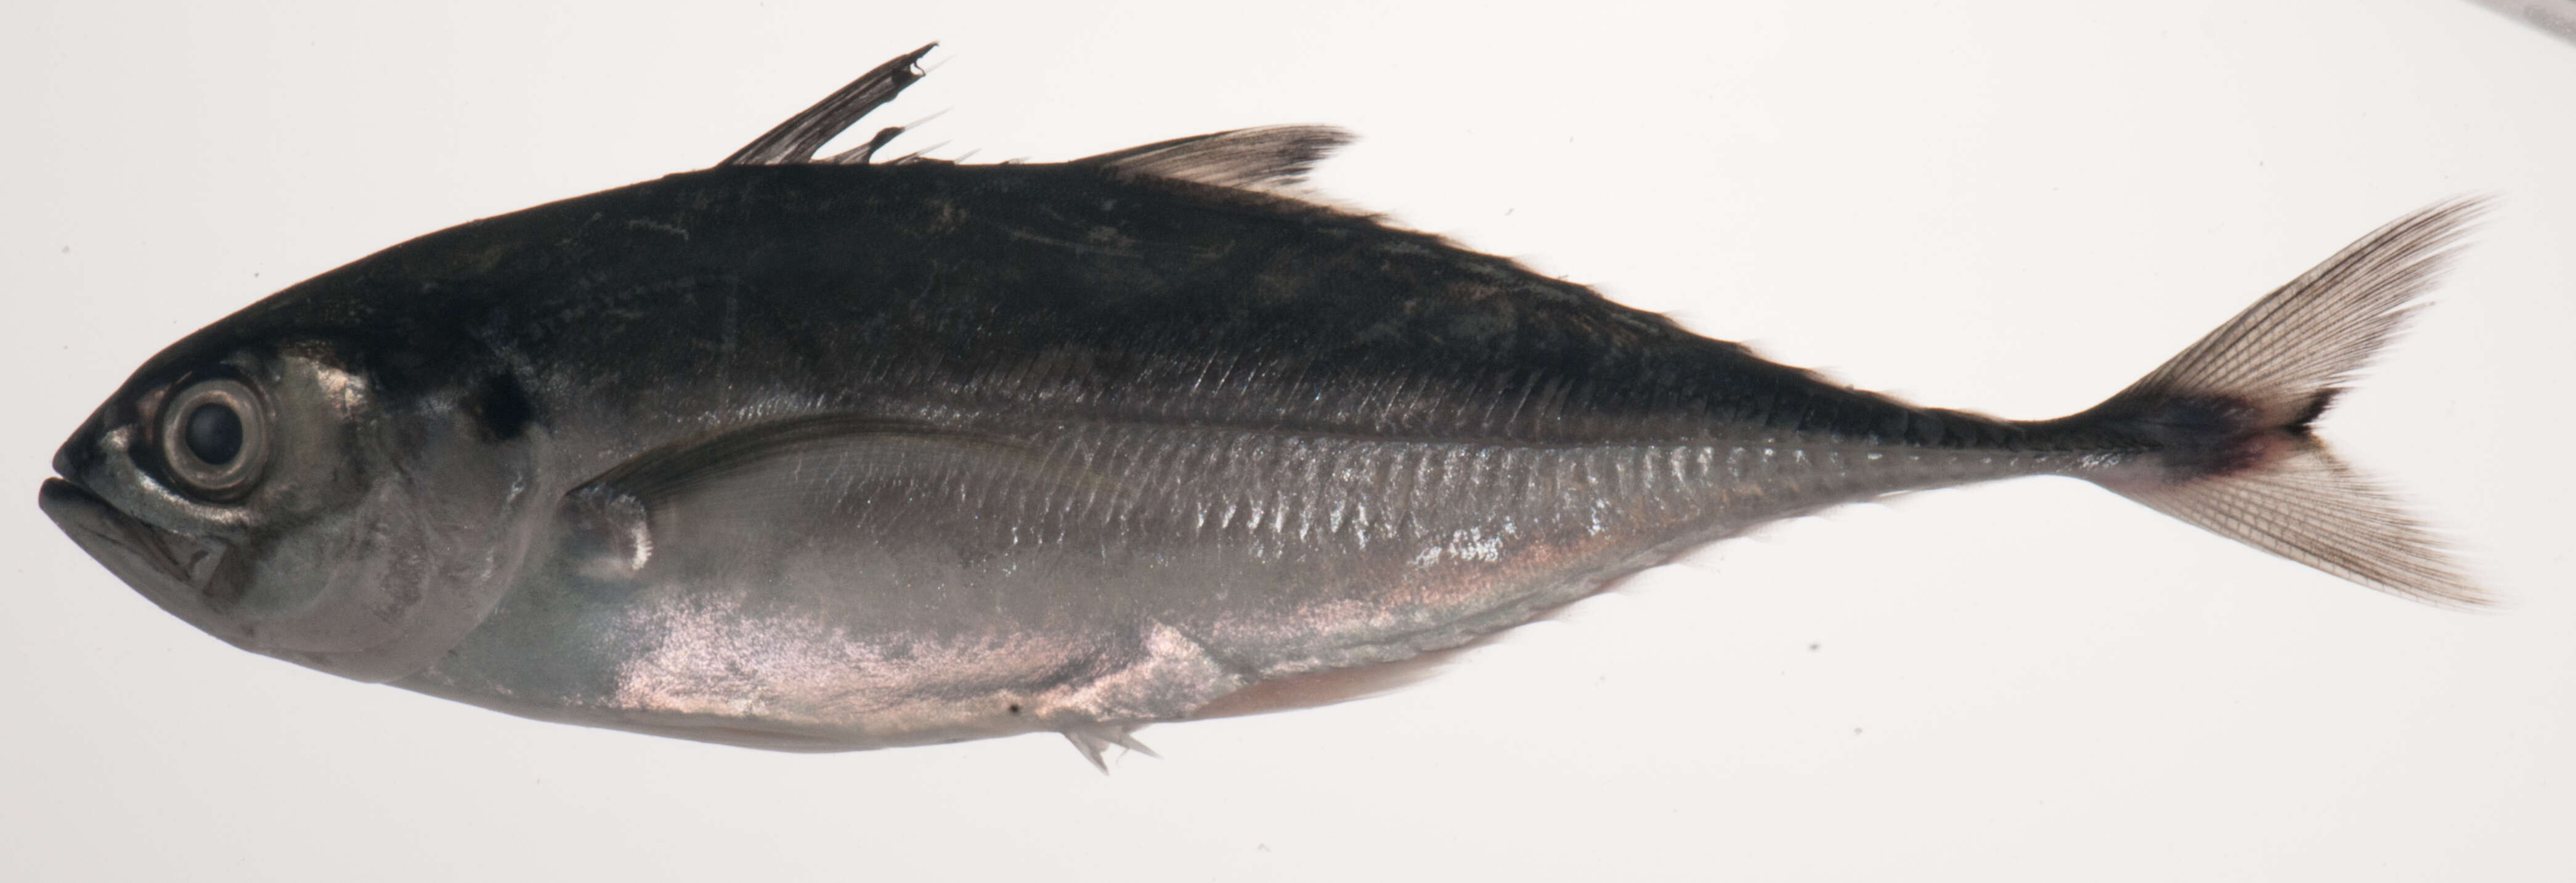 Image of opisthokonts